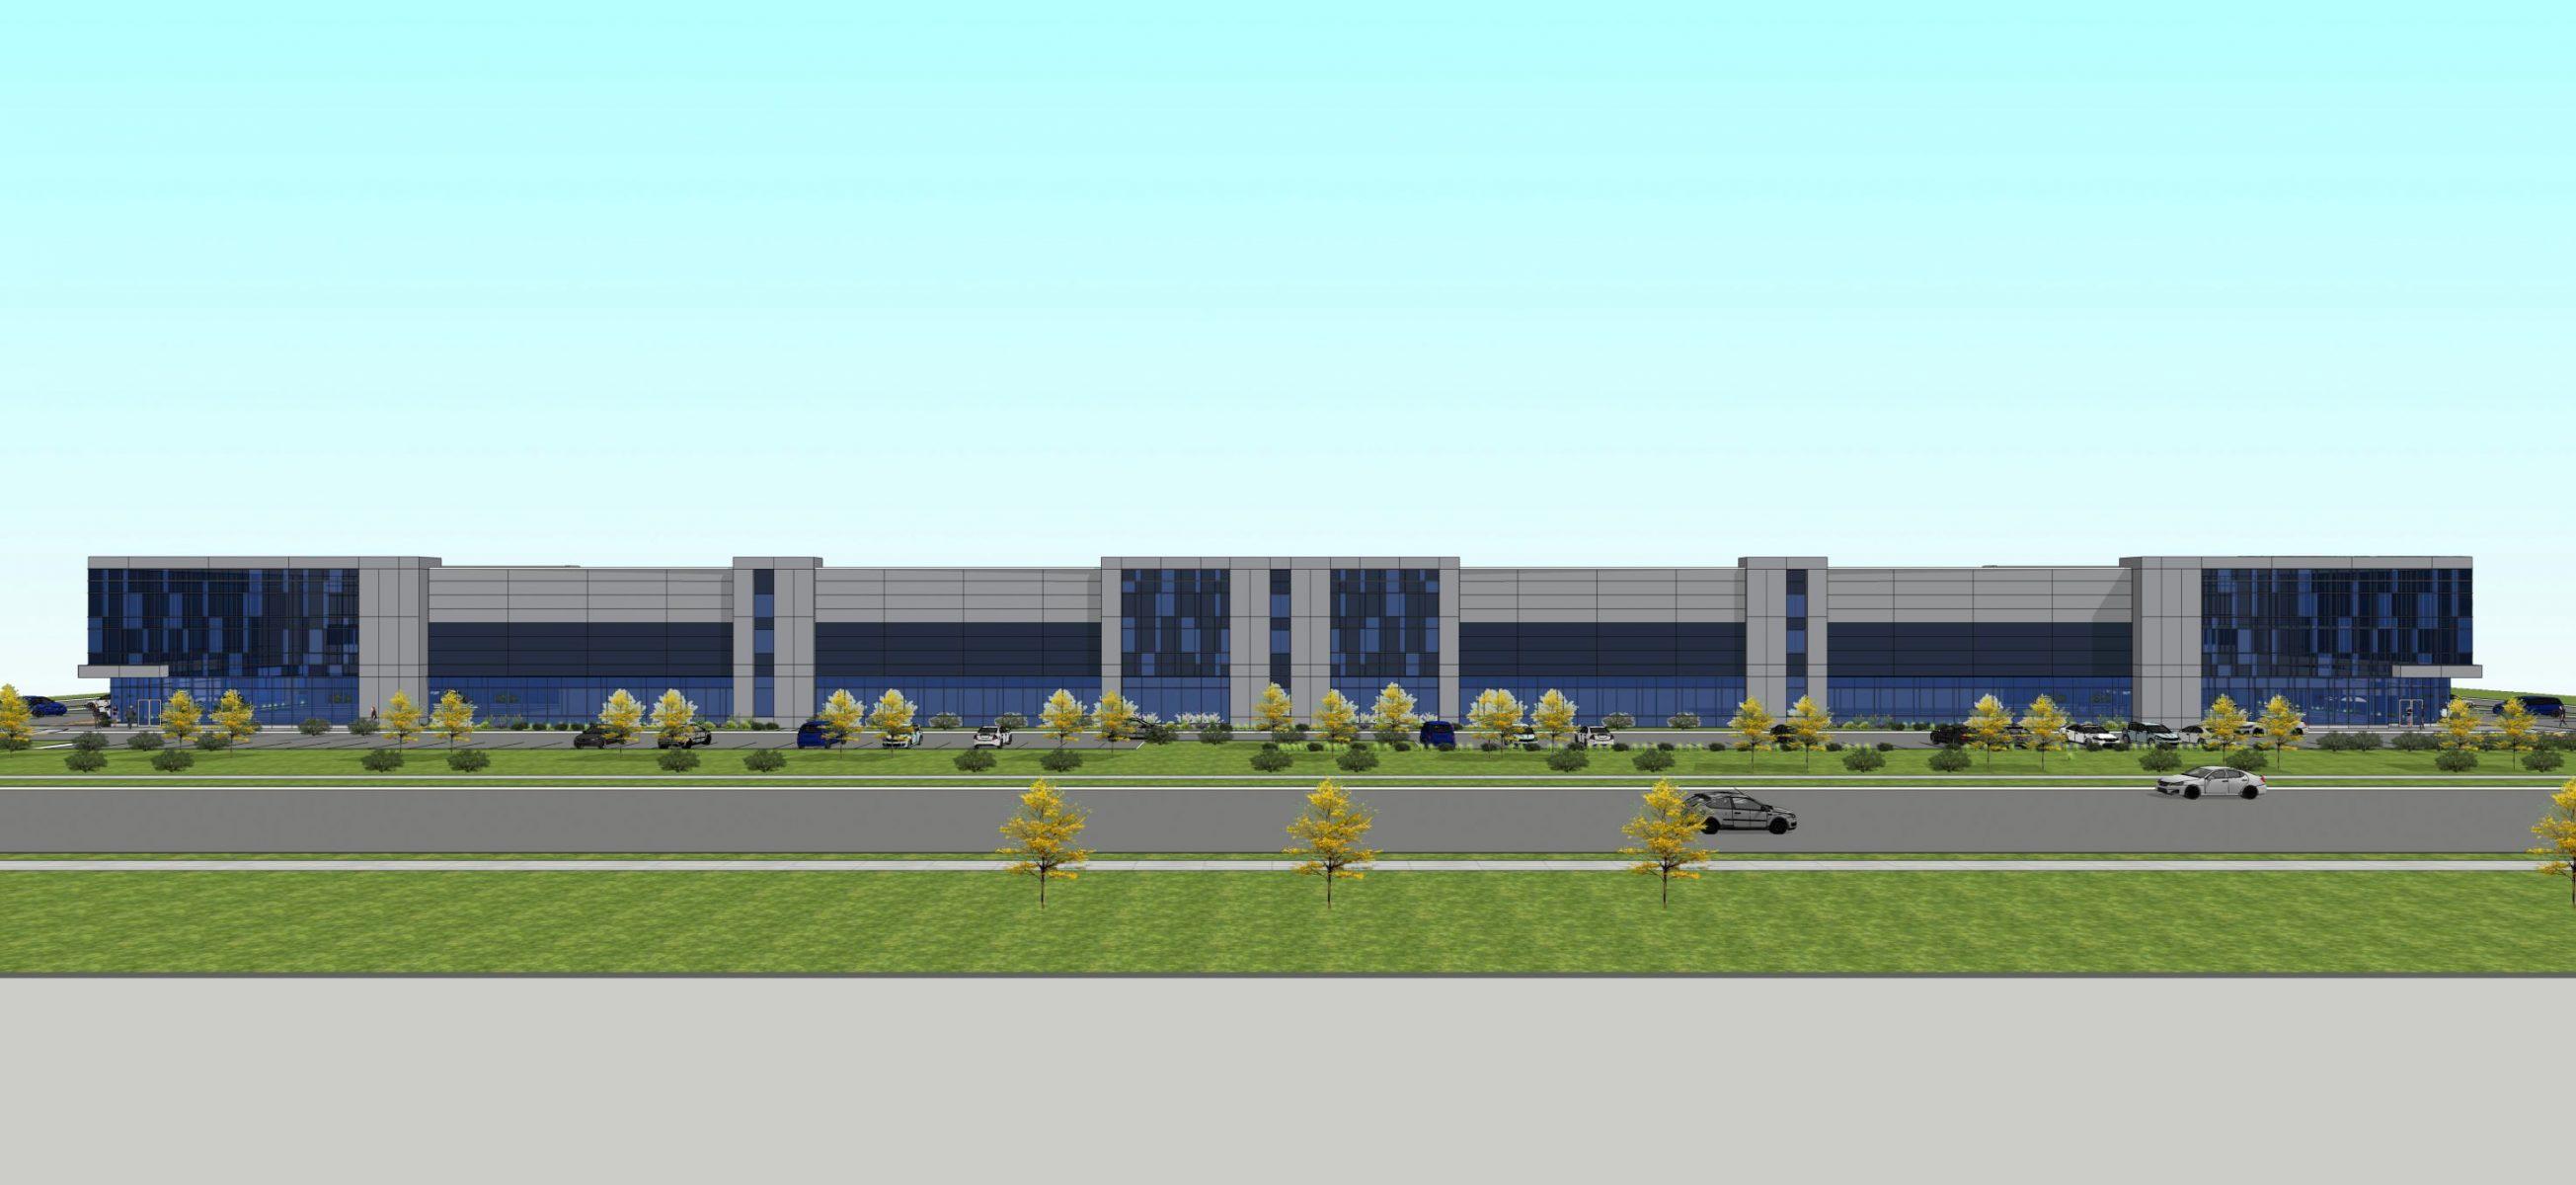 Korsiak Urban Planning - Brampton Portfolio - Kennedy Road, Industrial Development - Brampton, Ontario